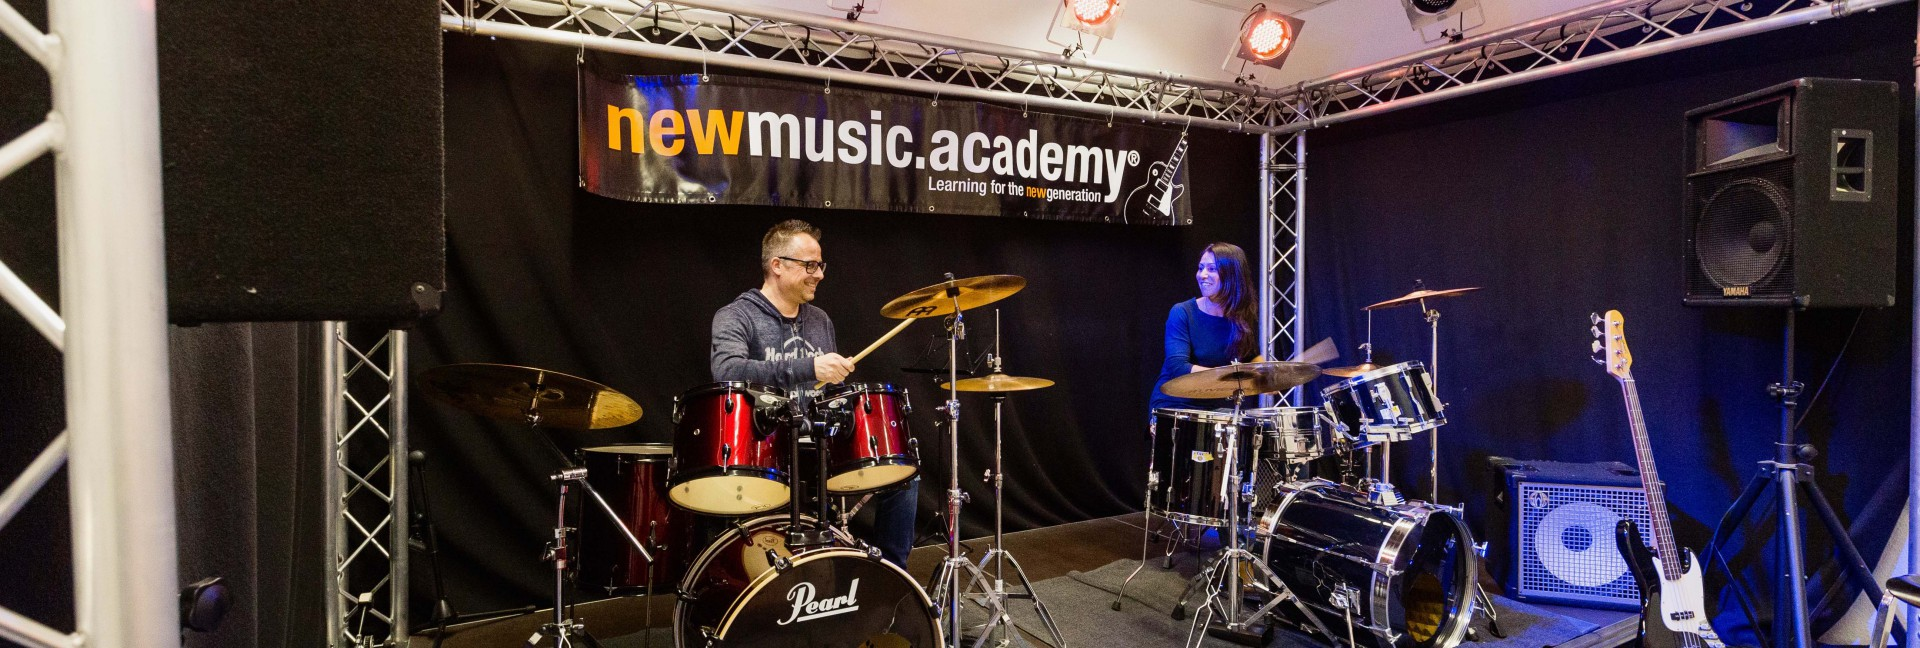 Drums-51_Slider.jpg